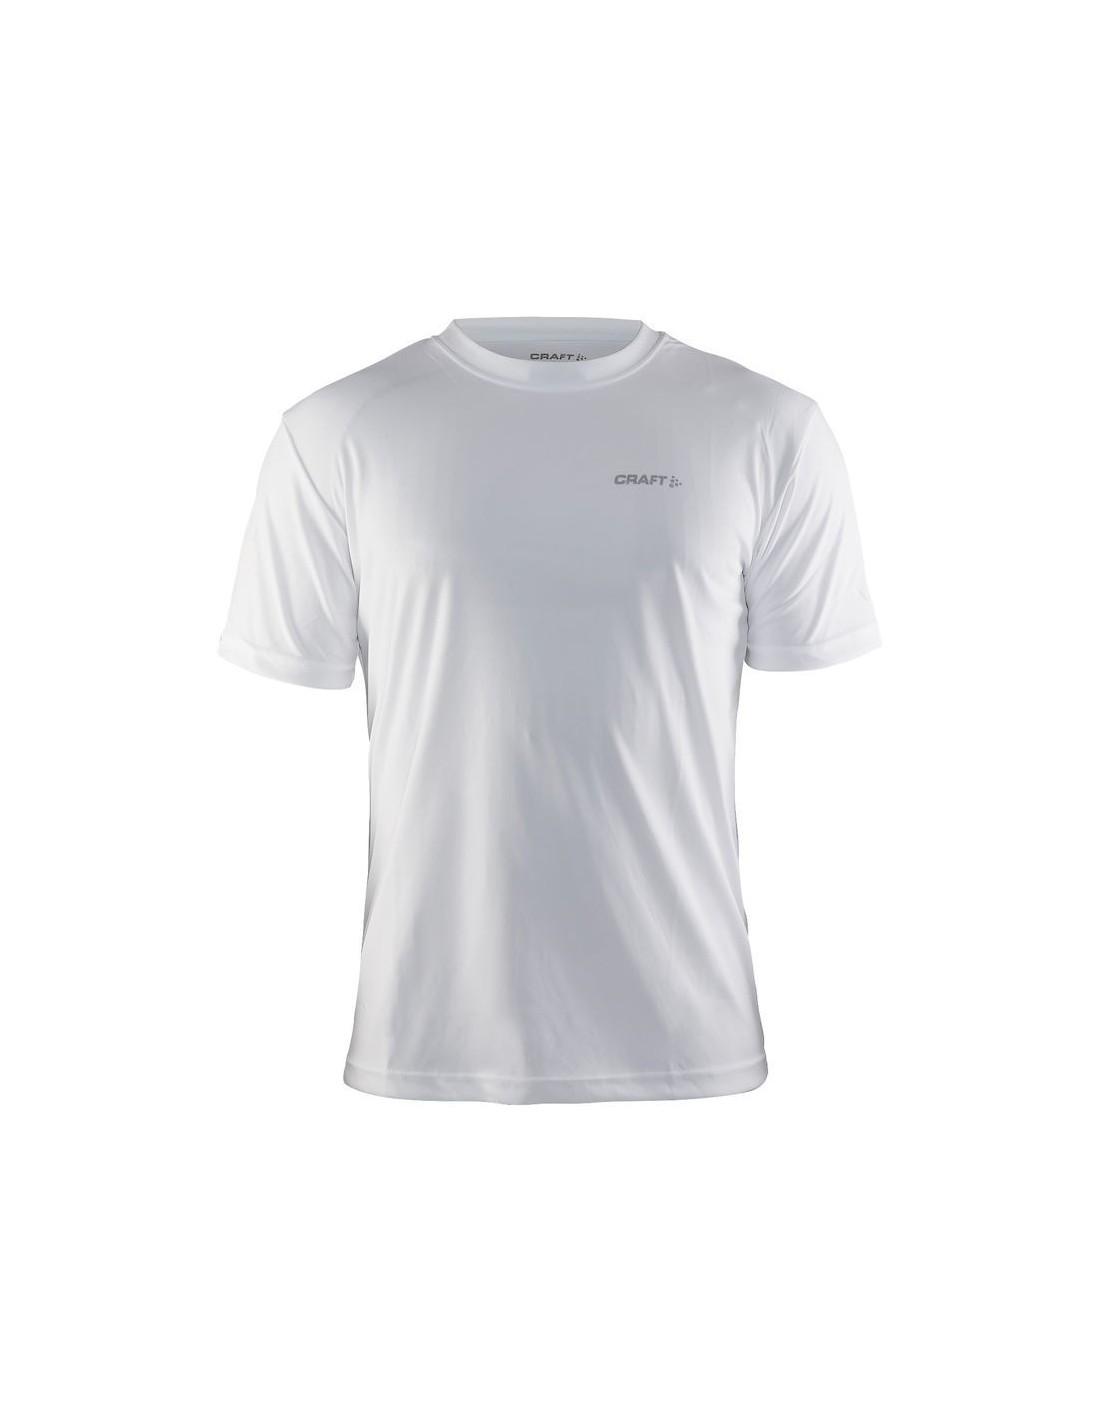 ce78d15c4dda47 Koszulka sportowa męska Craft Prime Tee biała - STSklep